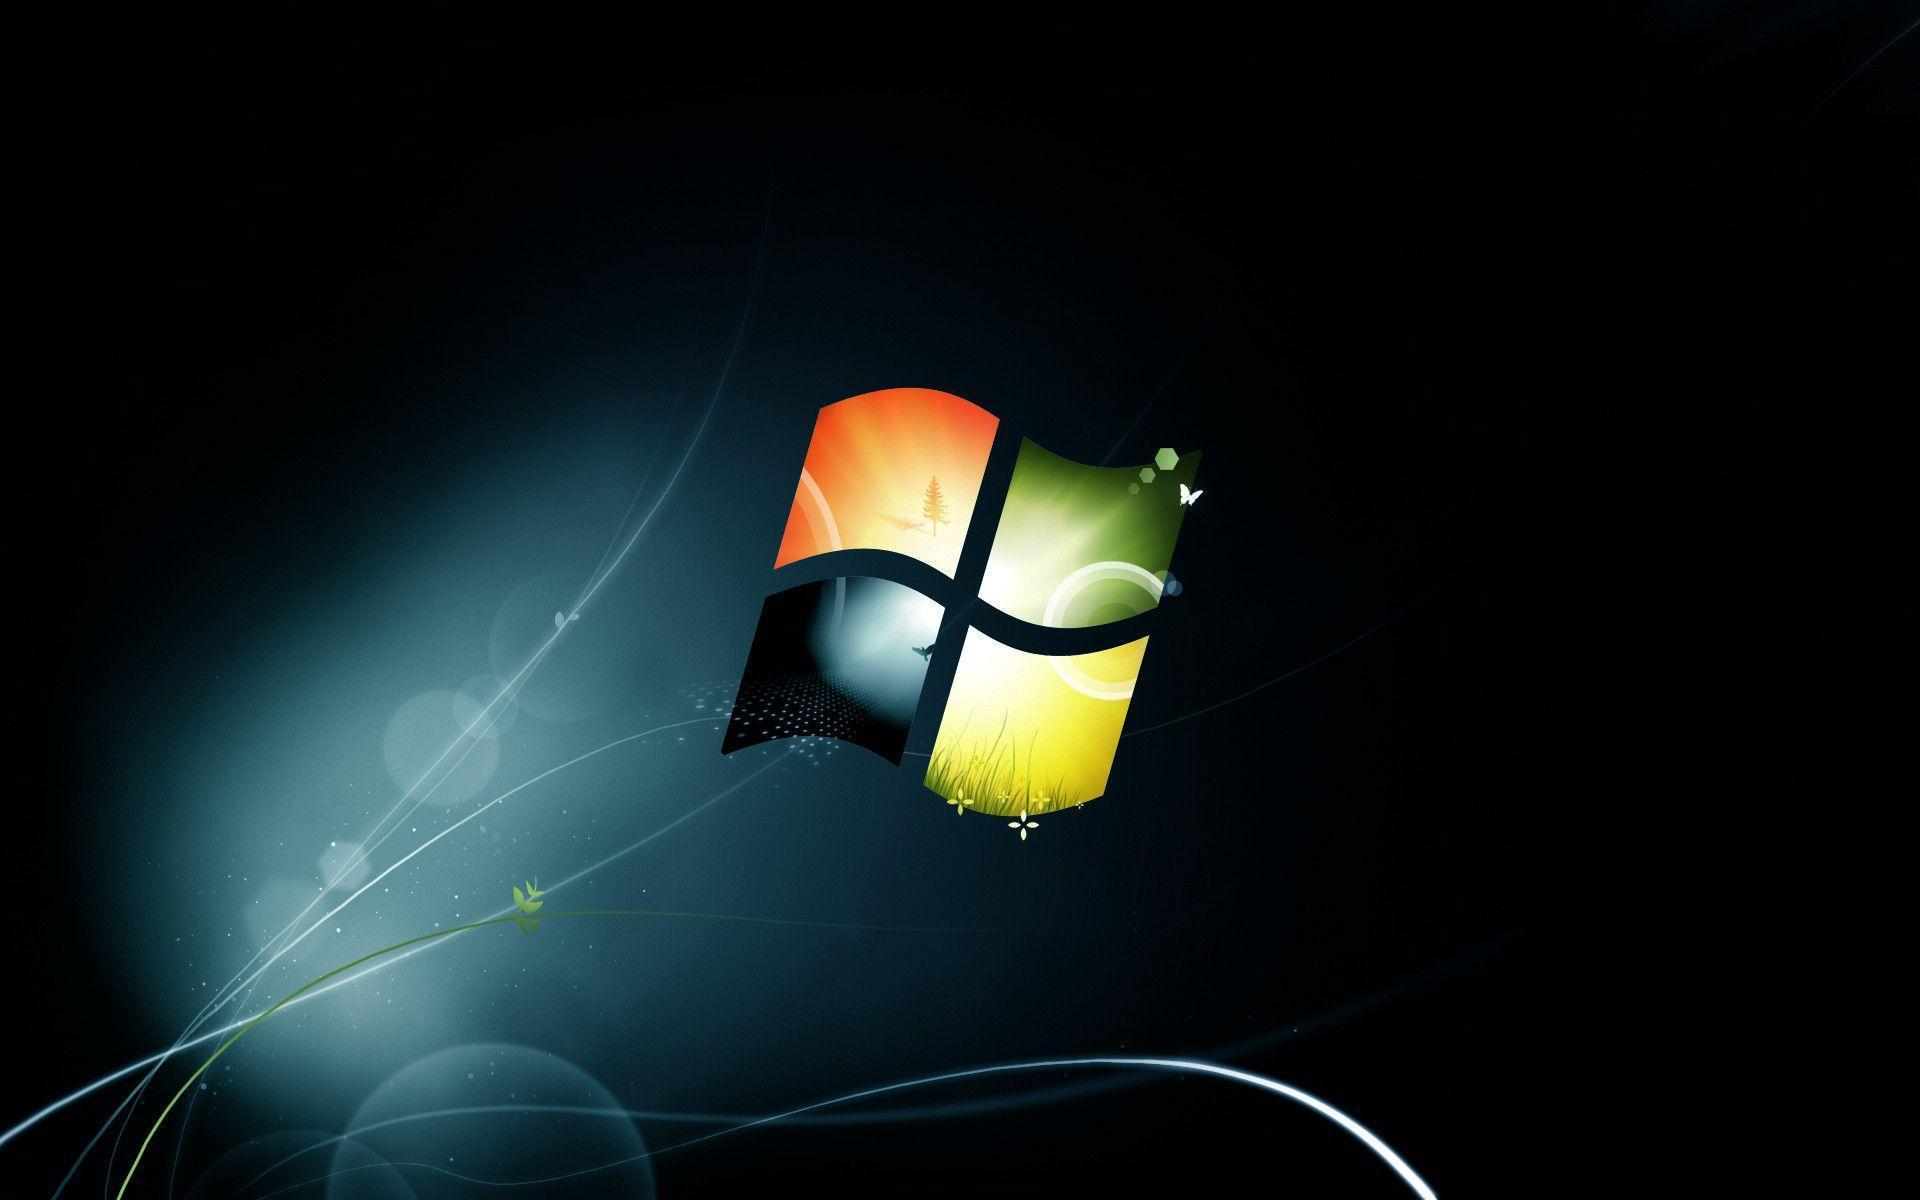 Best Windows 7 Backgrounds - Wallpaper Cave